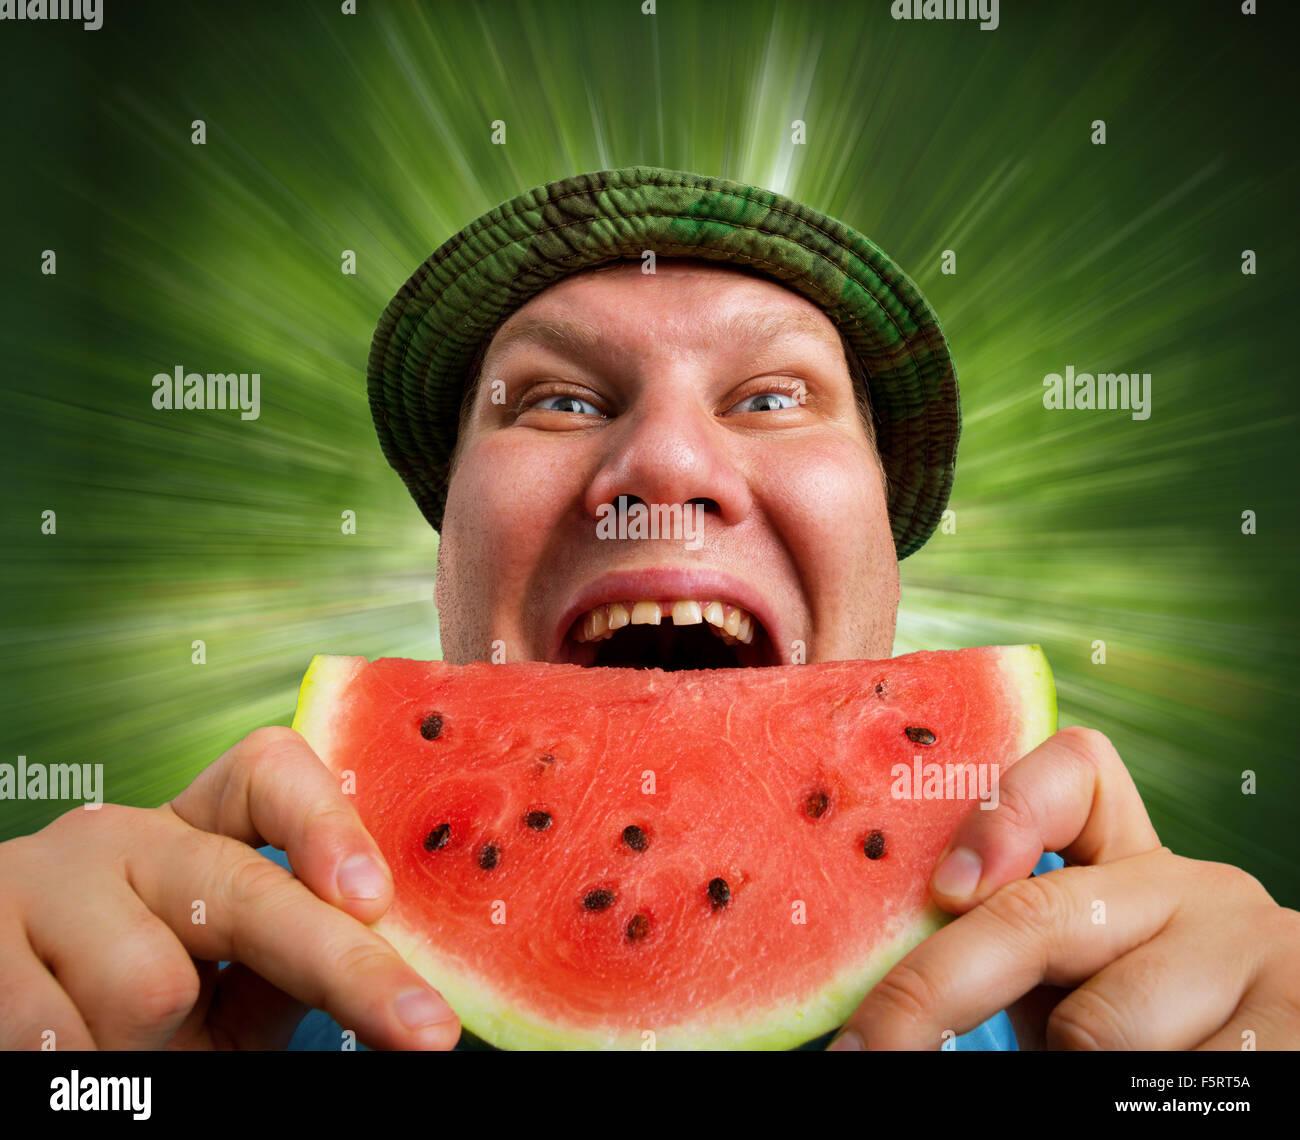 Bizarre Mann isst Wassermelone im Freien im Sommer Stockbild